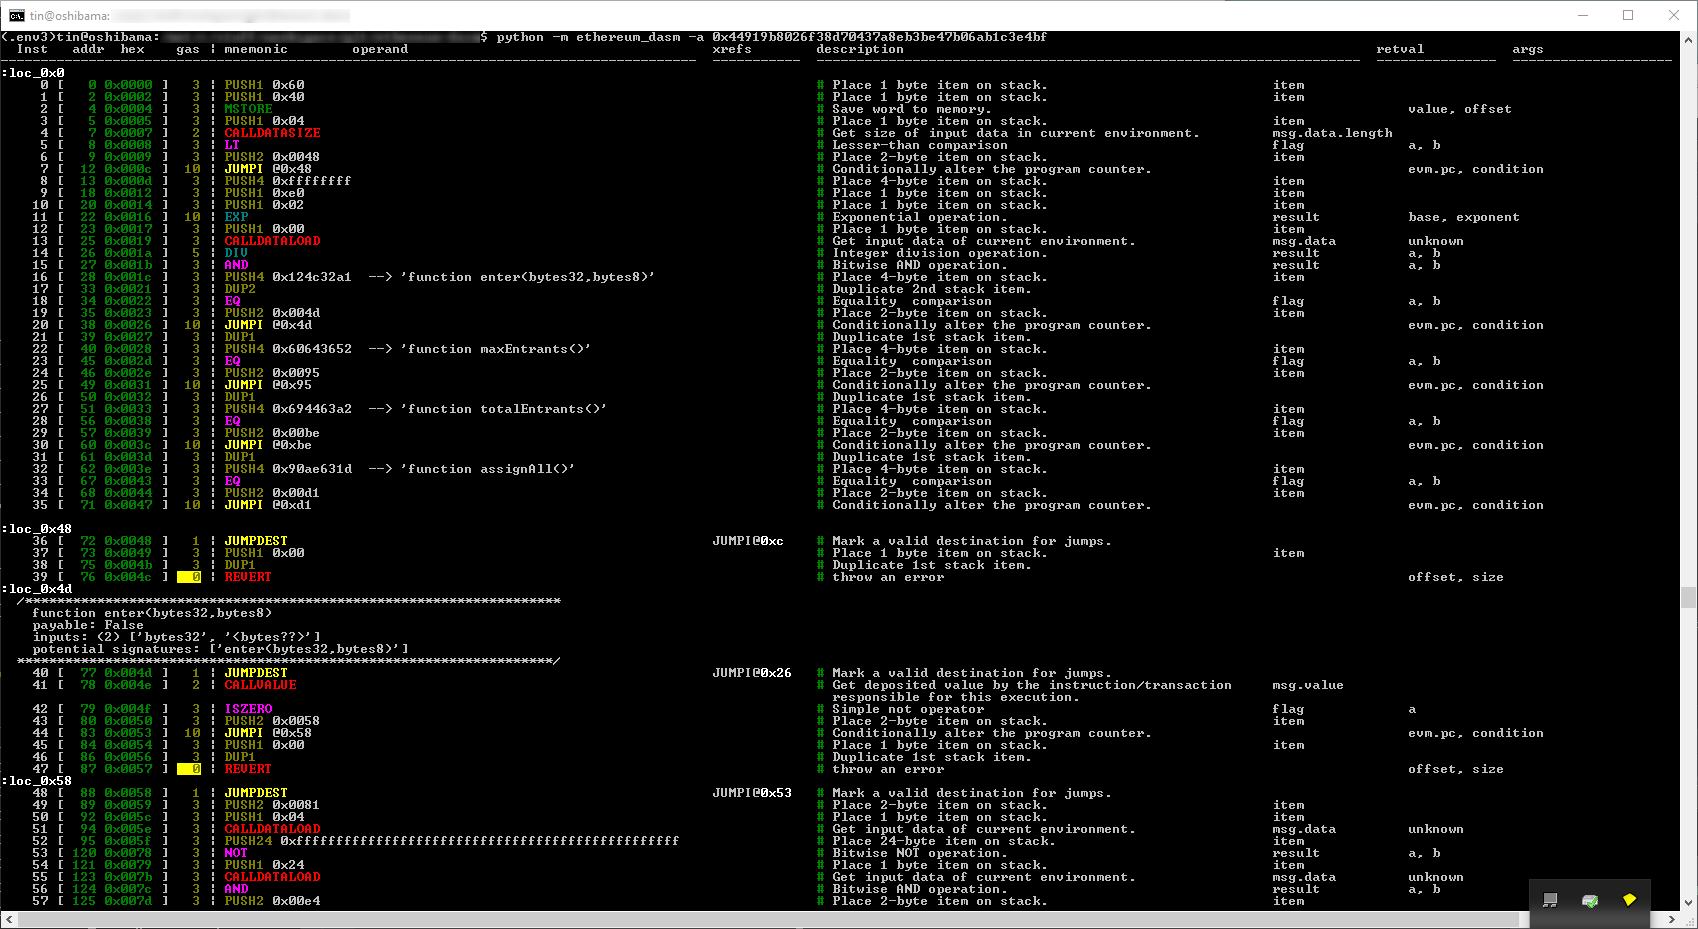 GitHub - tintinweb/ethereum-dasm: An ethereum evm bytecode